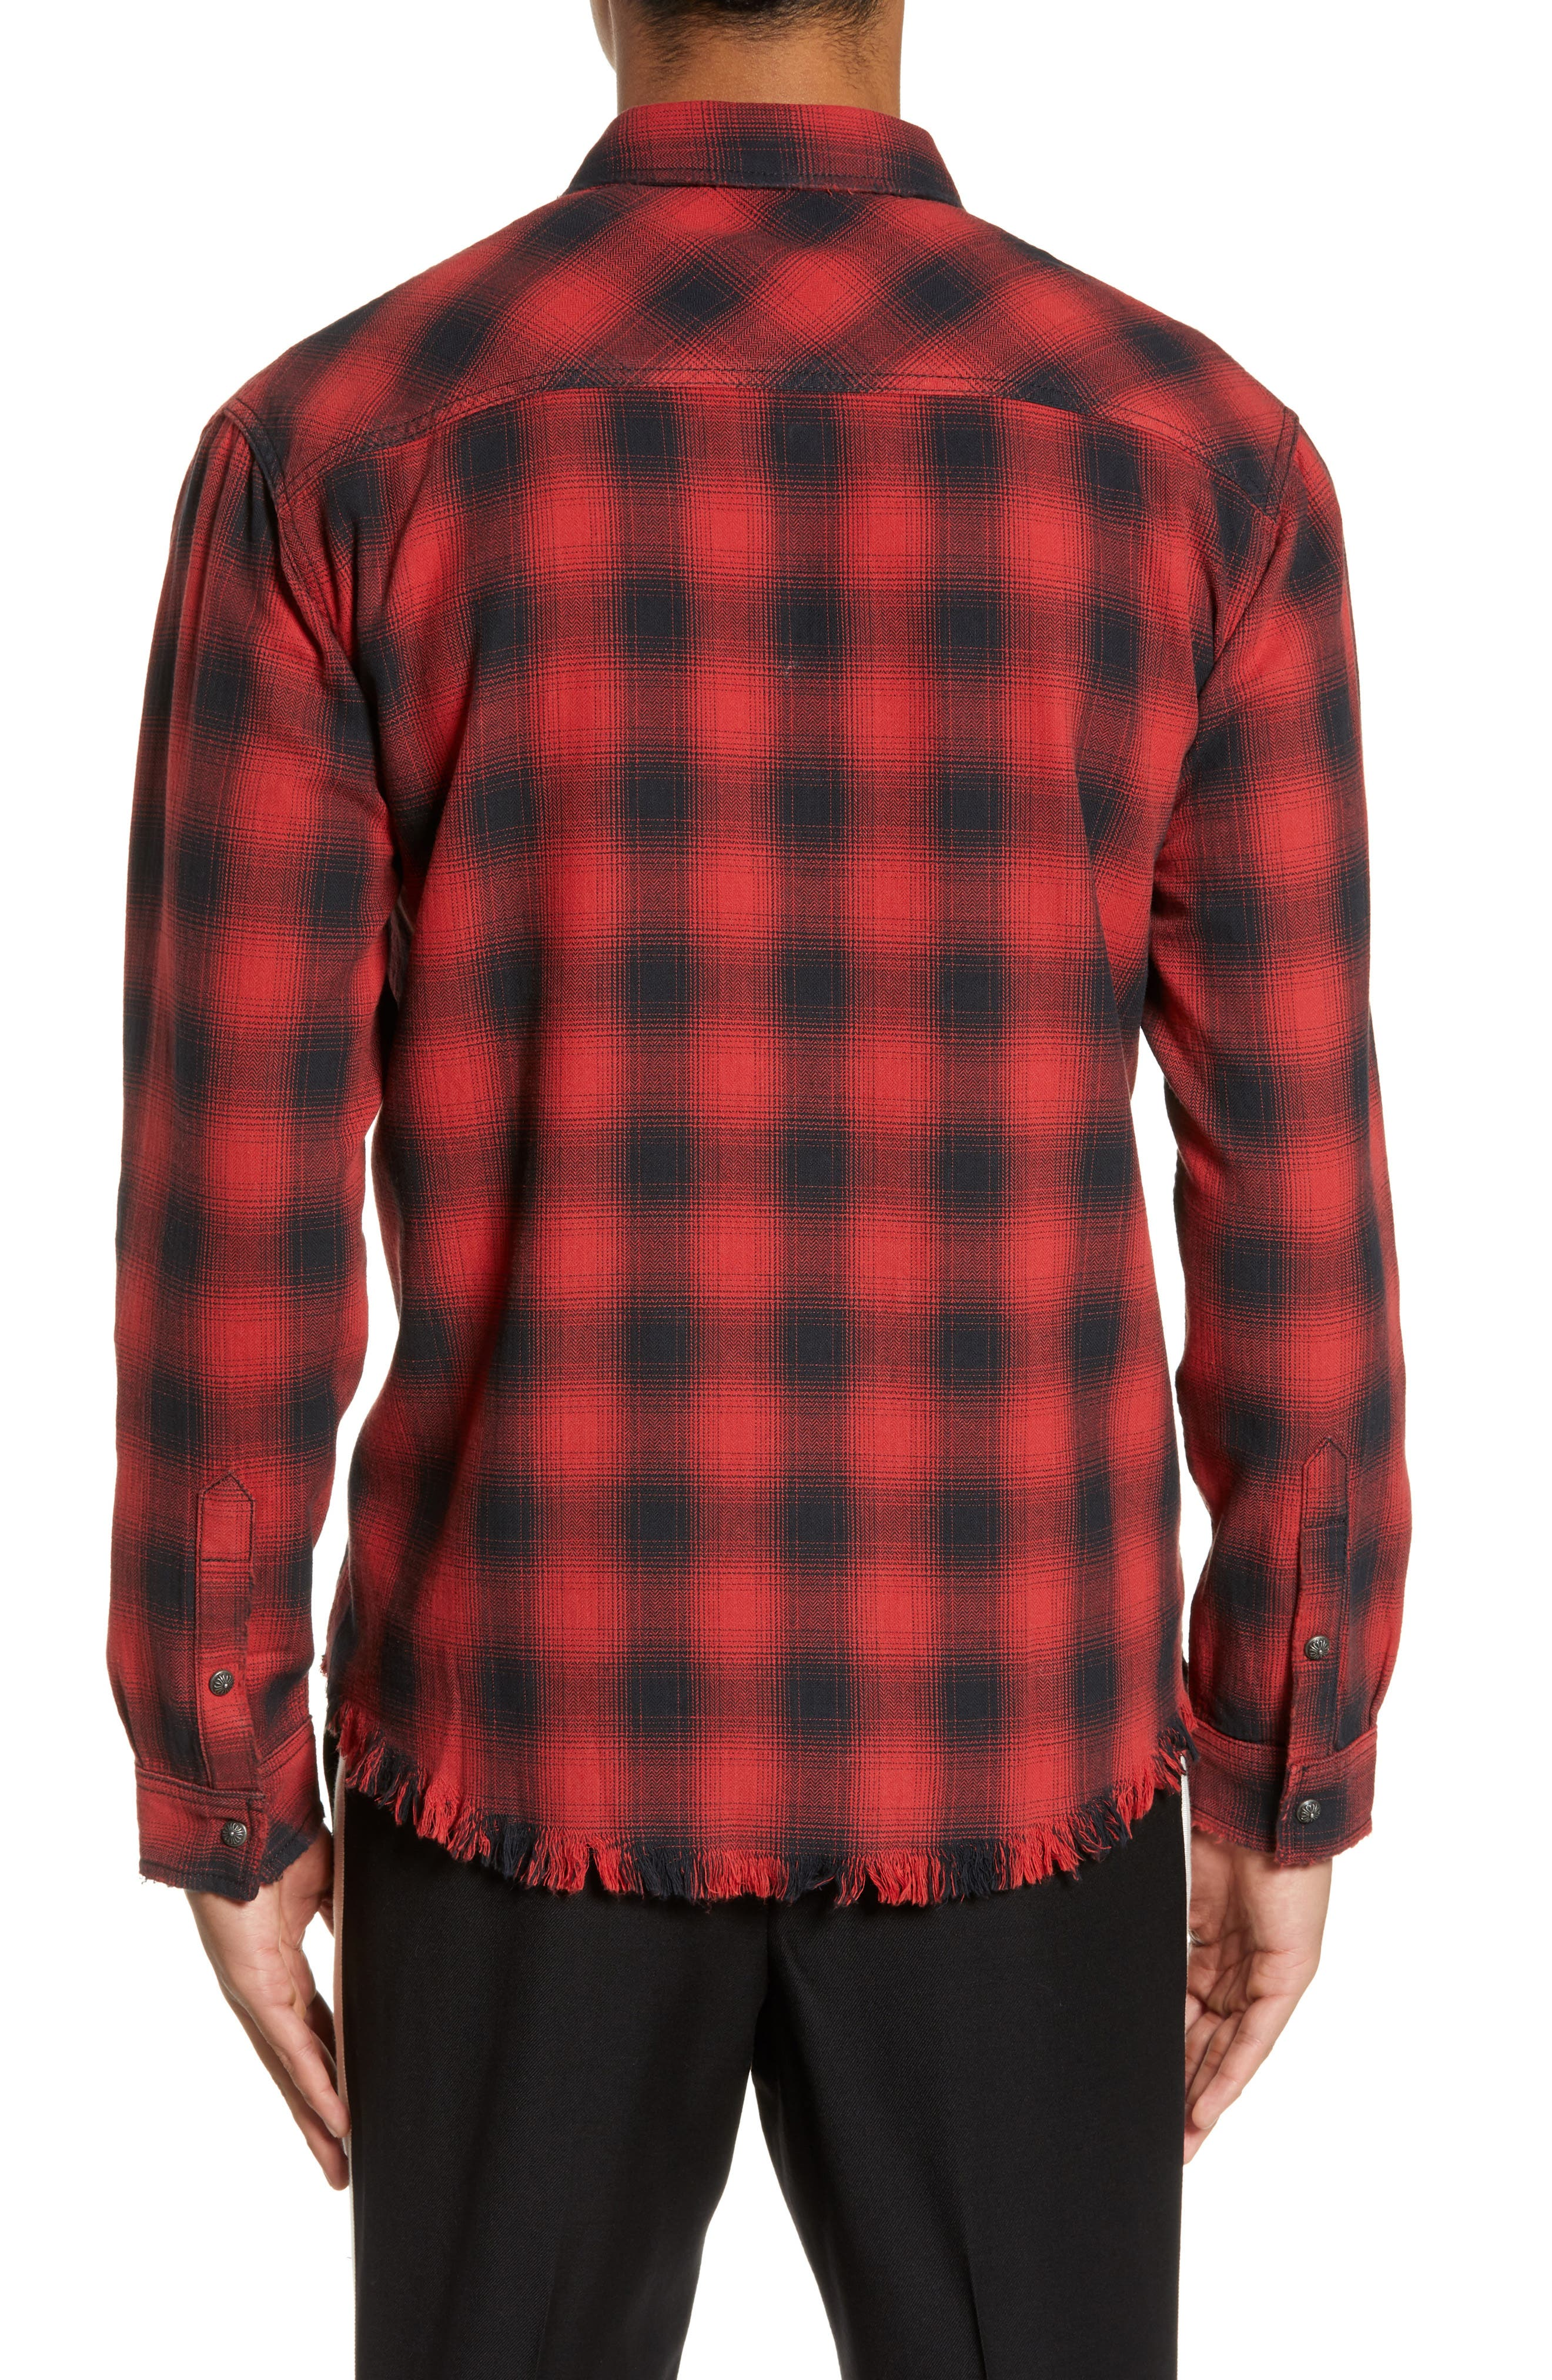 THE KOOPLES, Regular Fit Ombré Plaid Shirt, Alternate thumbnail 3, color, RED / BLACK